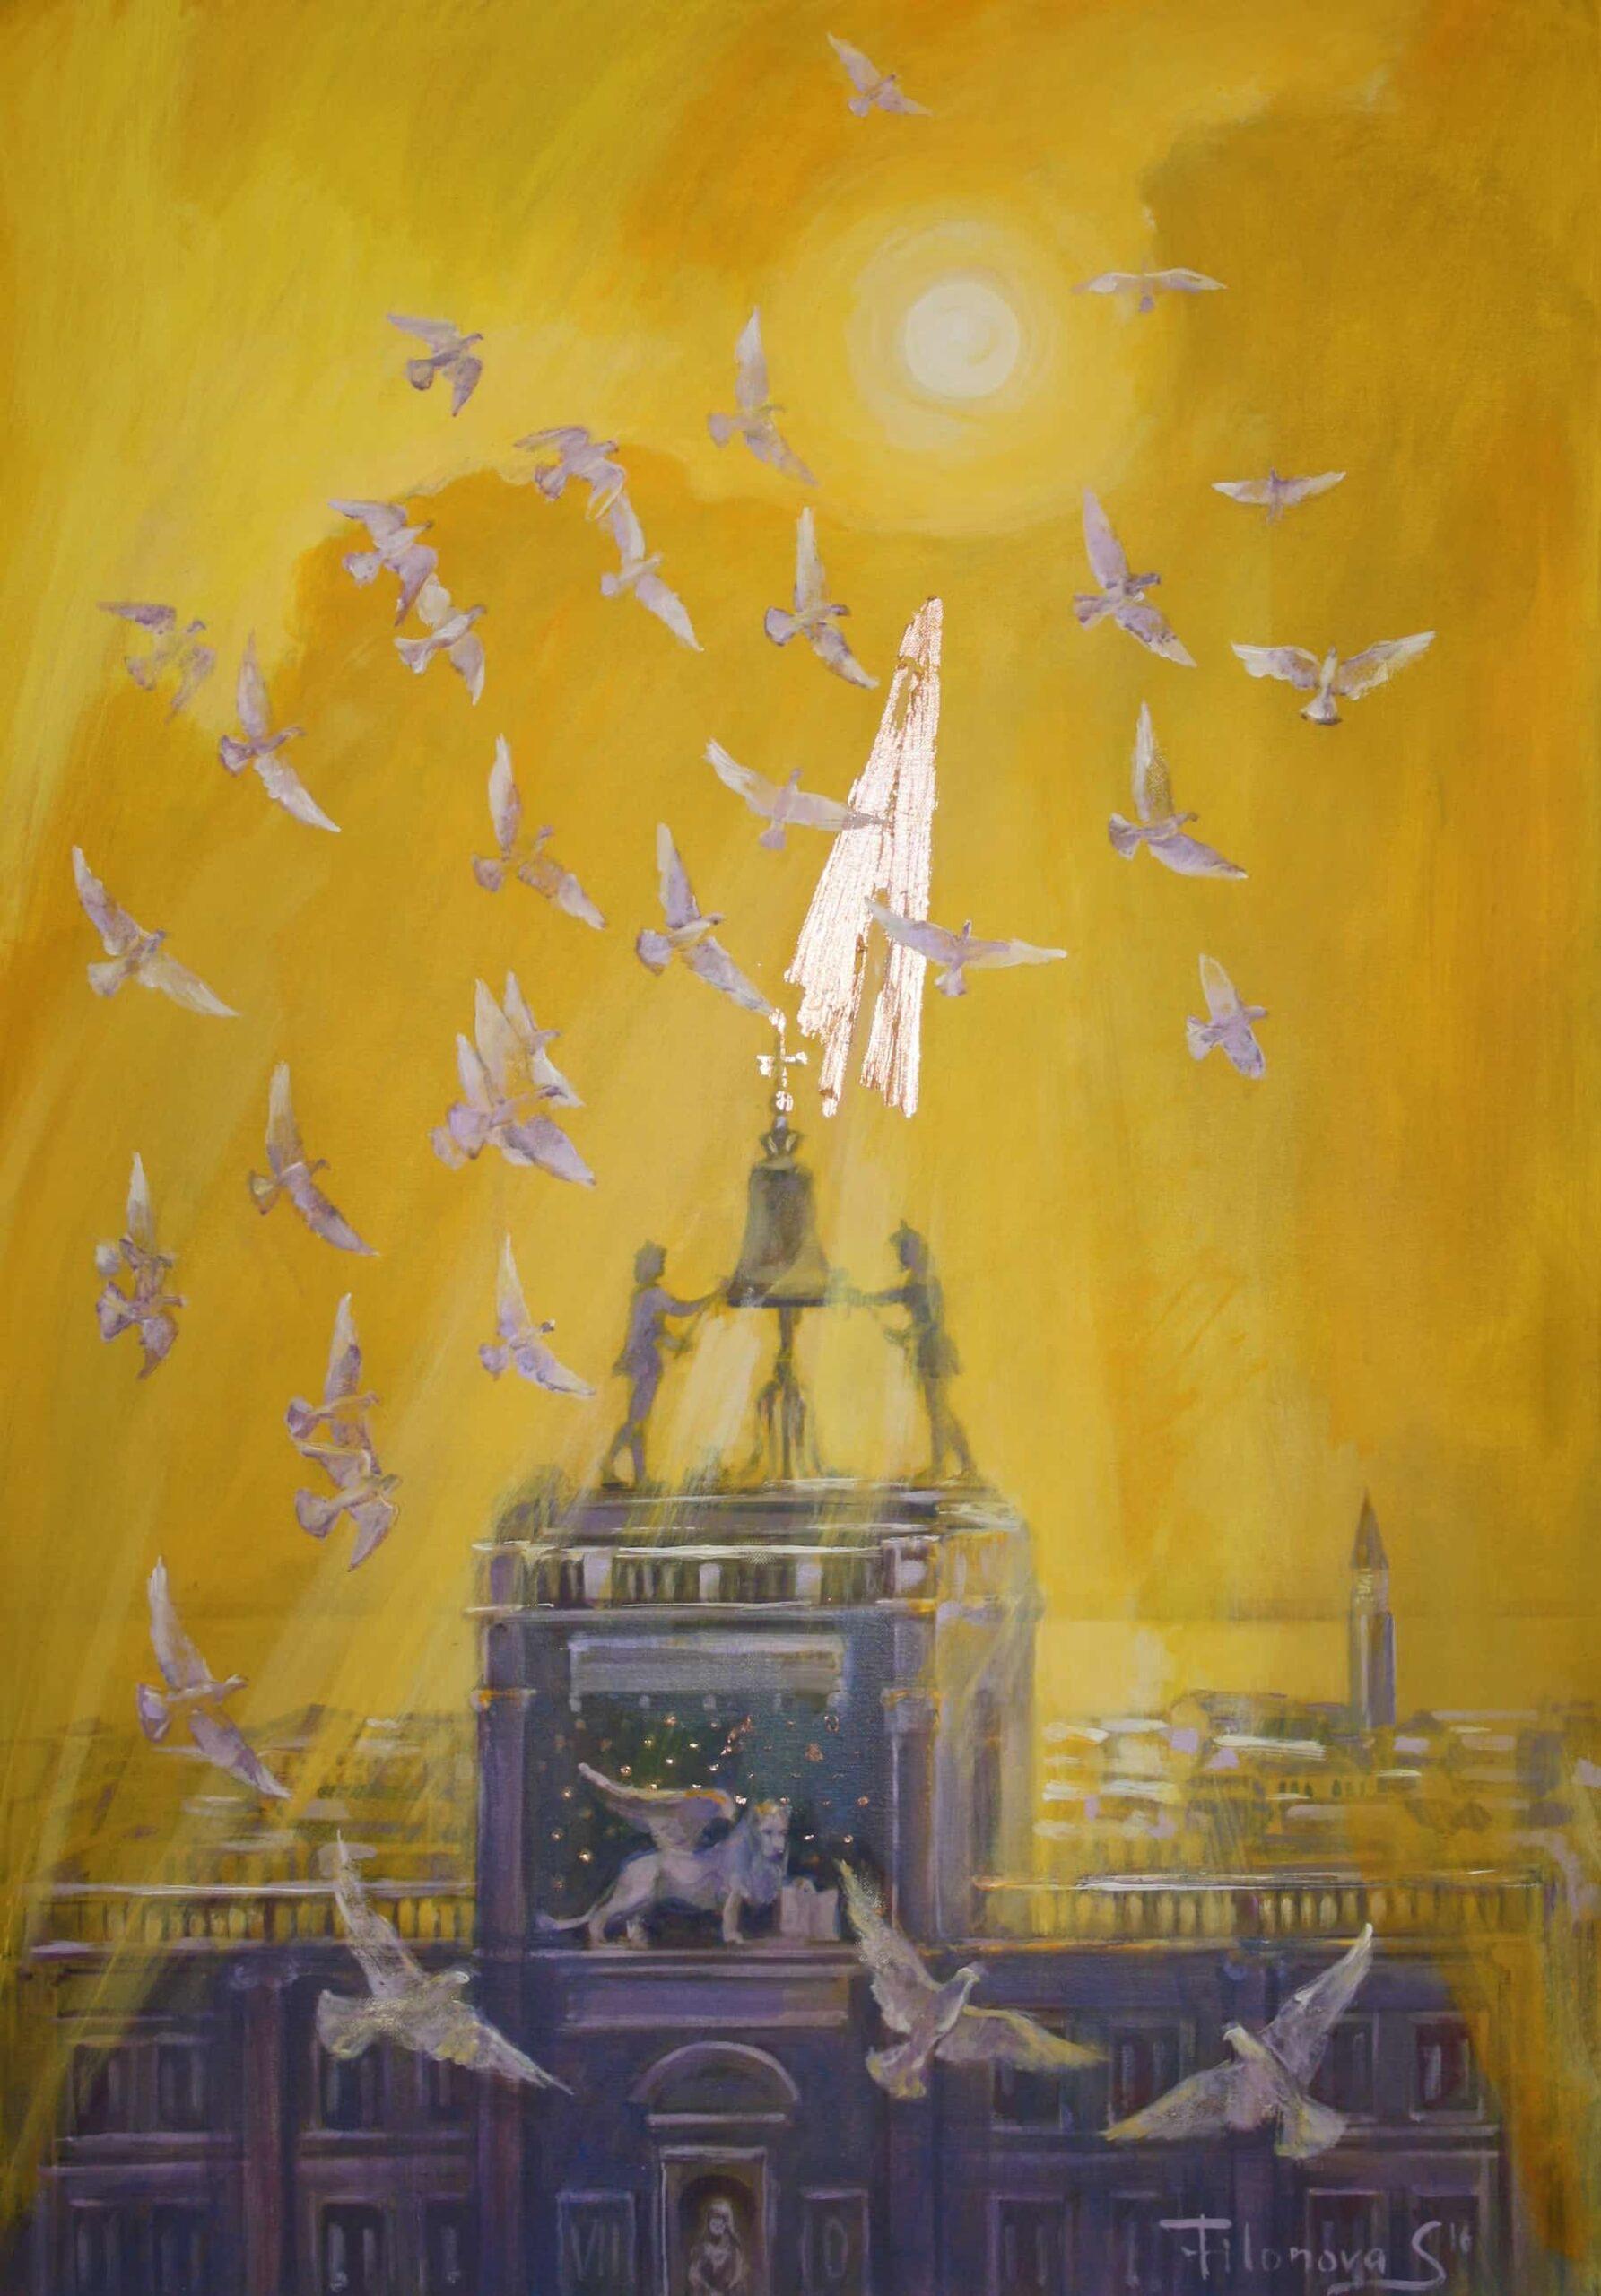 Venedig San Marko Pigeons 2_Acryl_Leinwand_70_100cm_2016Svetlana Catif-Filonova